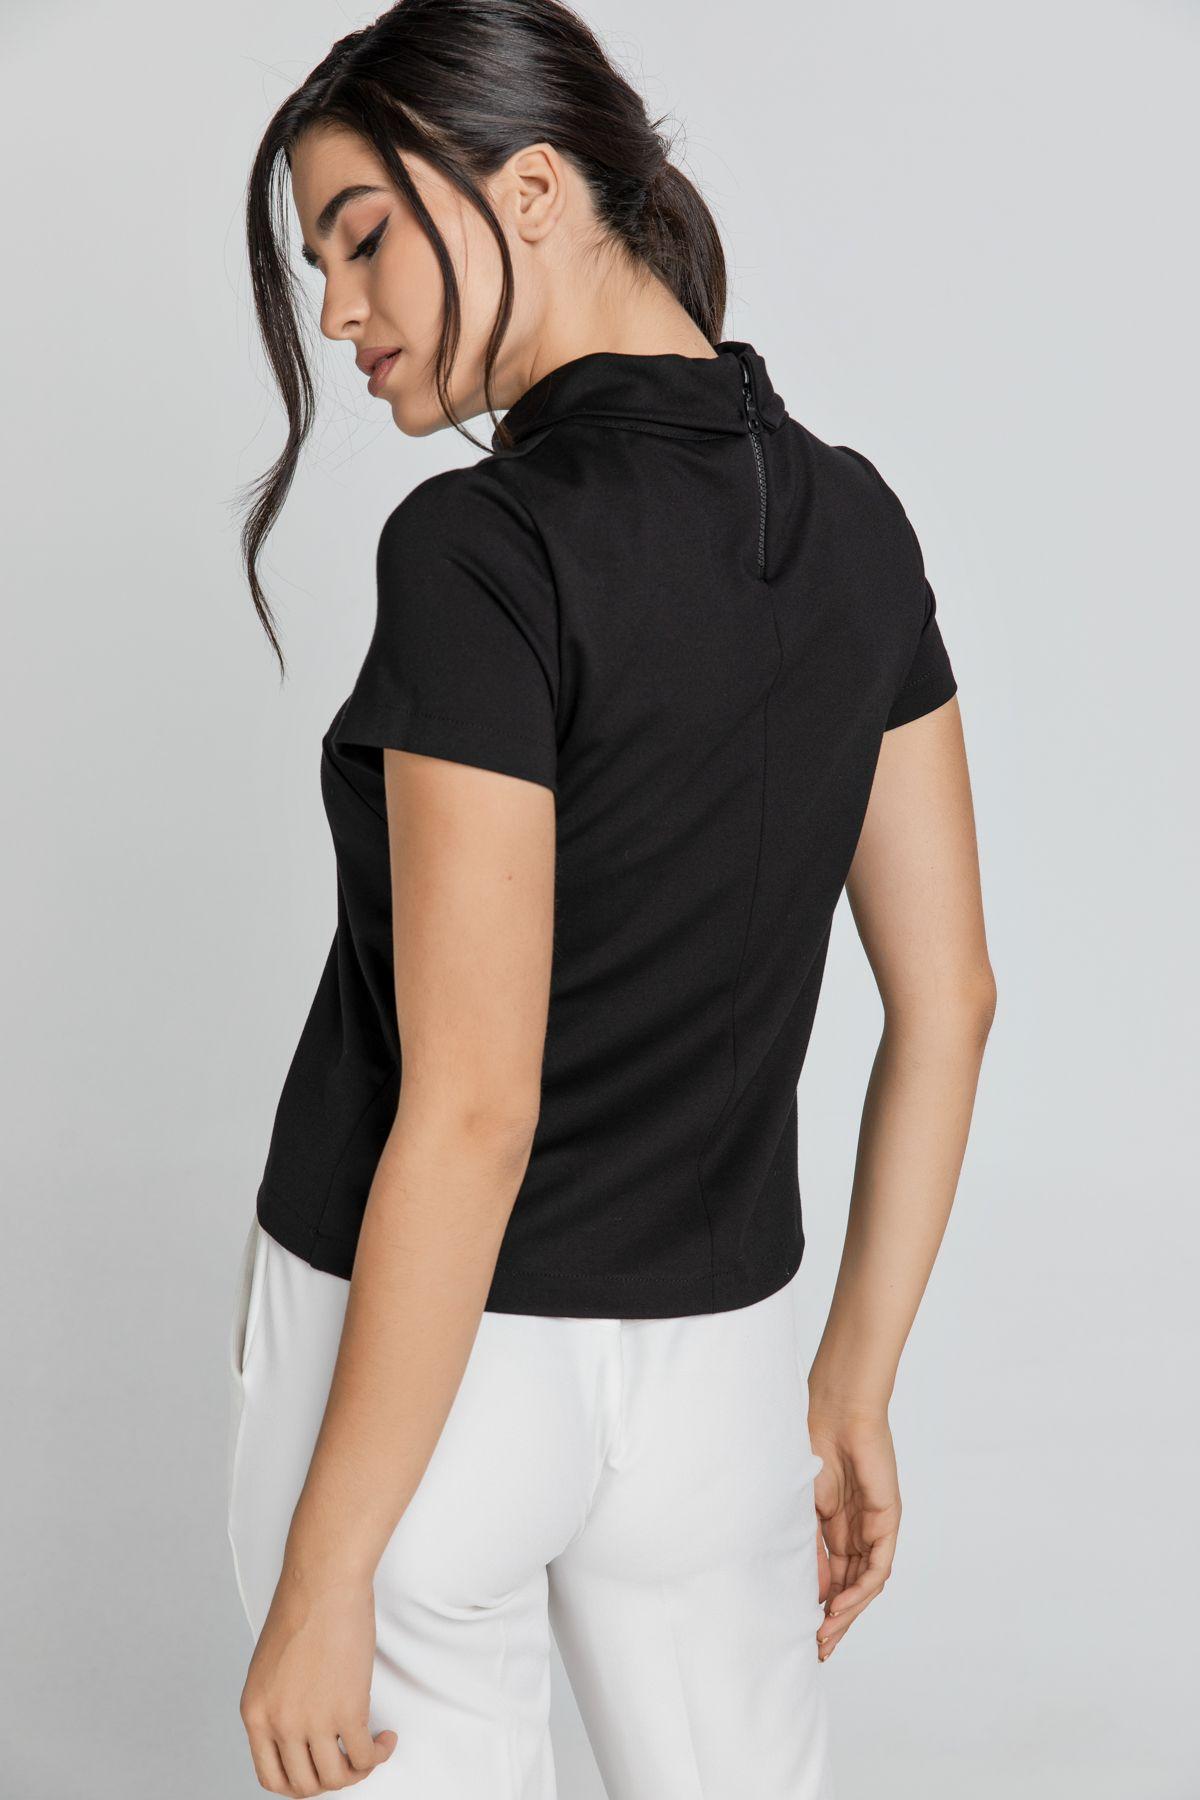 Short Sleeve Black Top